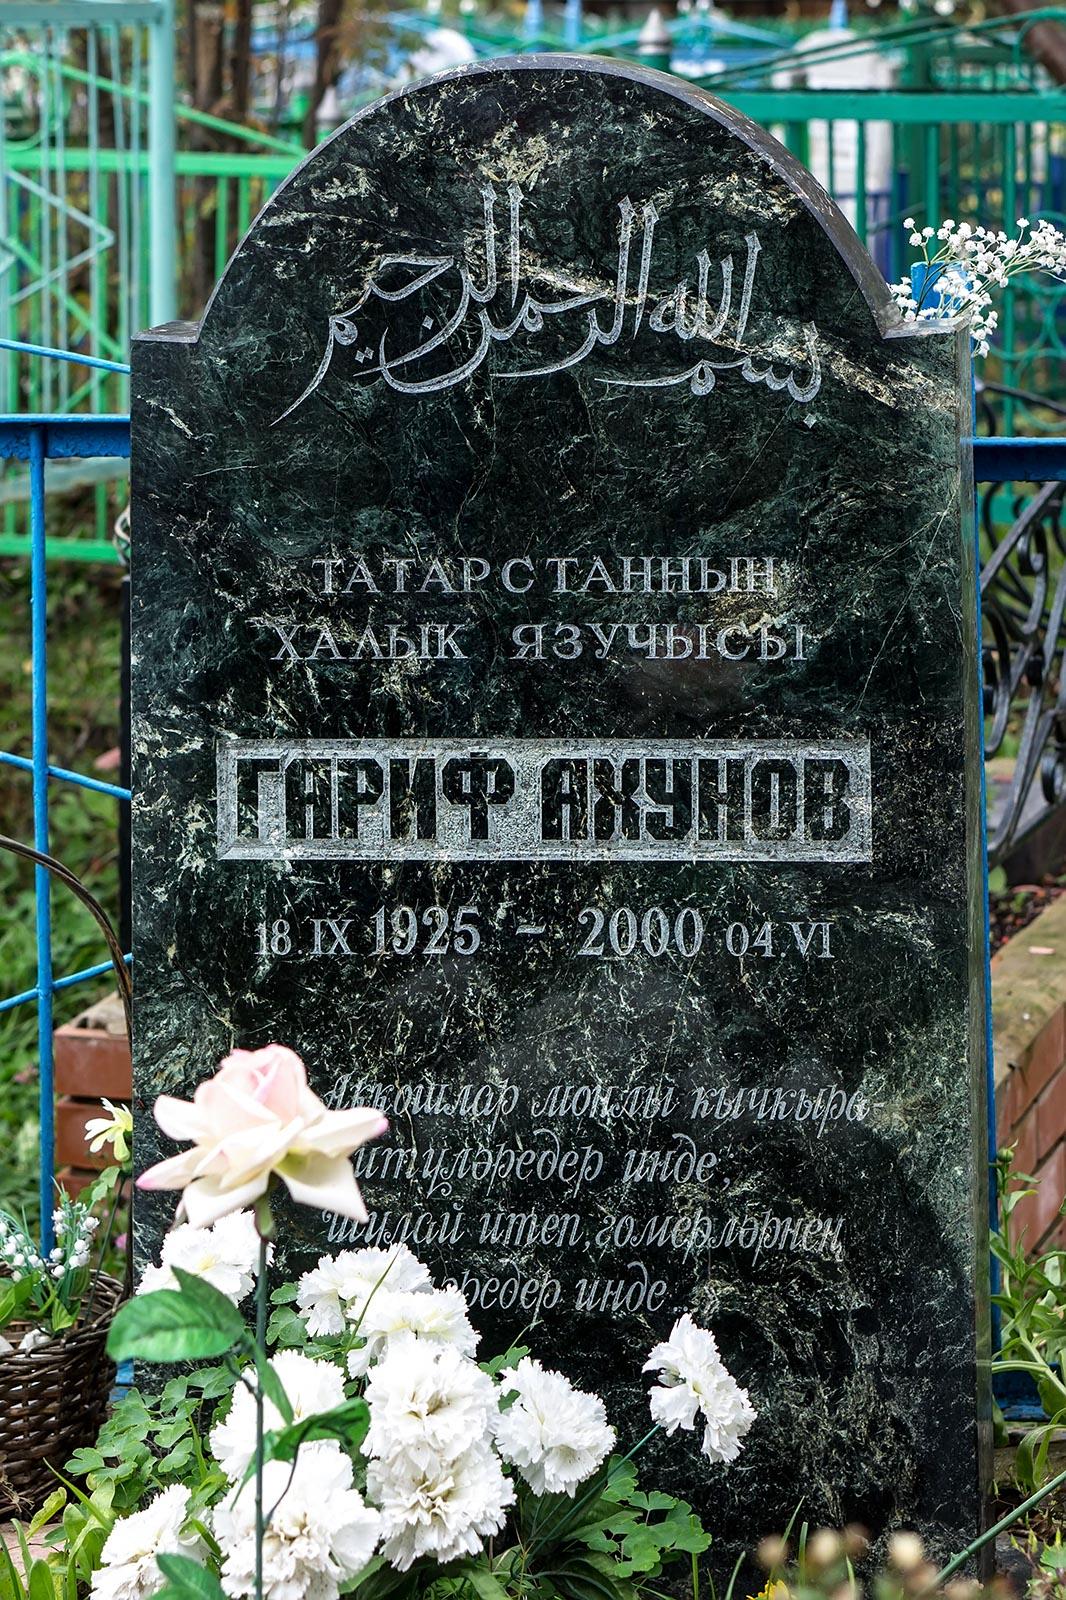 Фото №116327. Памятник Гарифу Ахунову